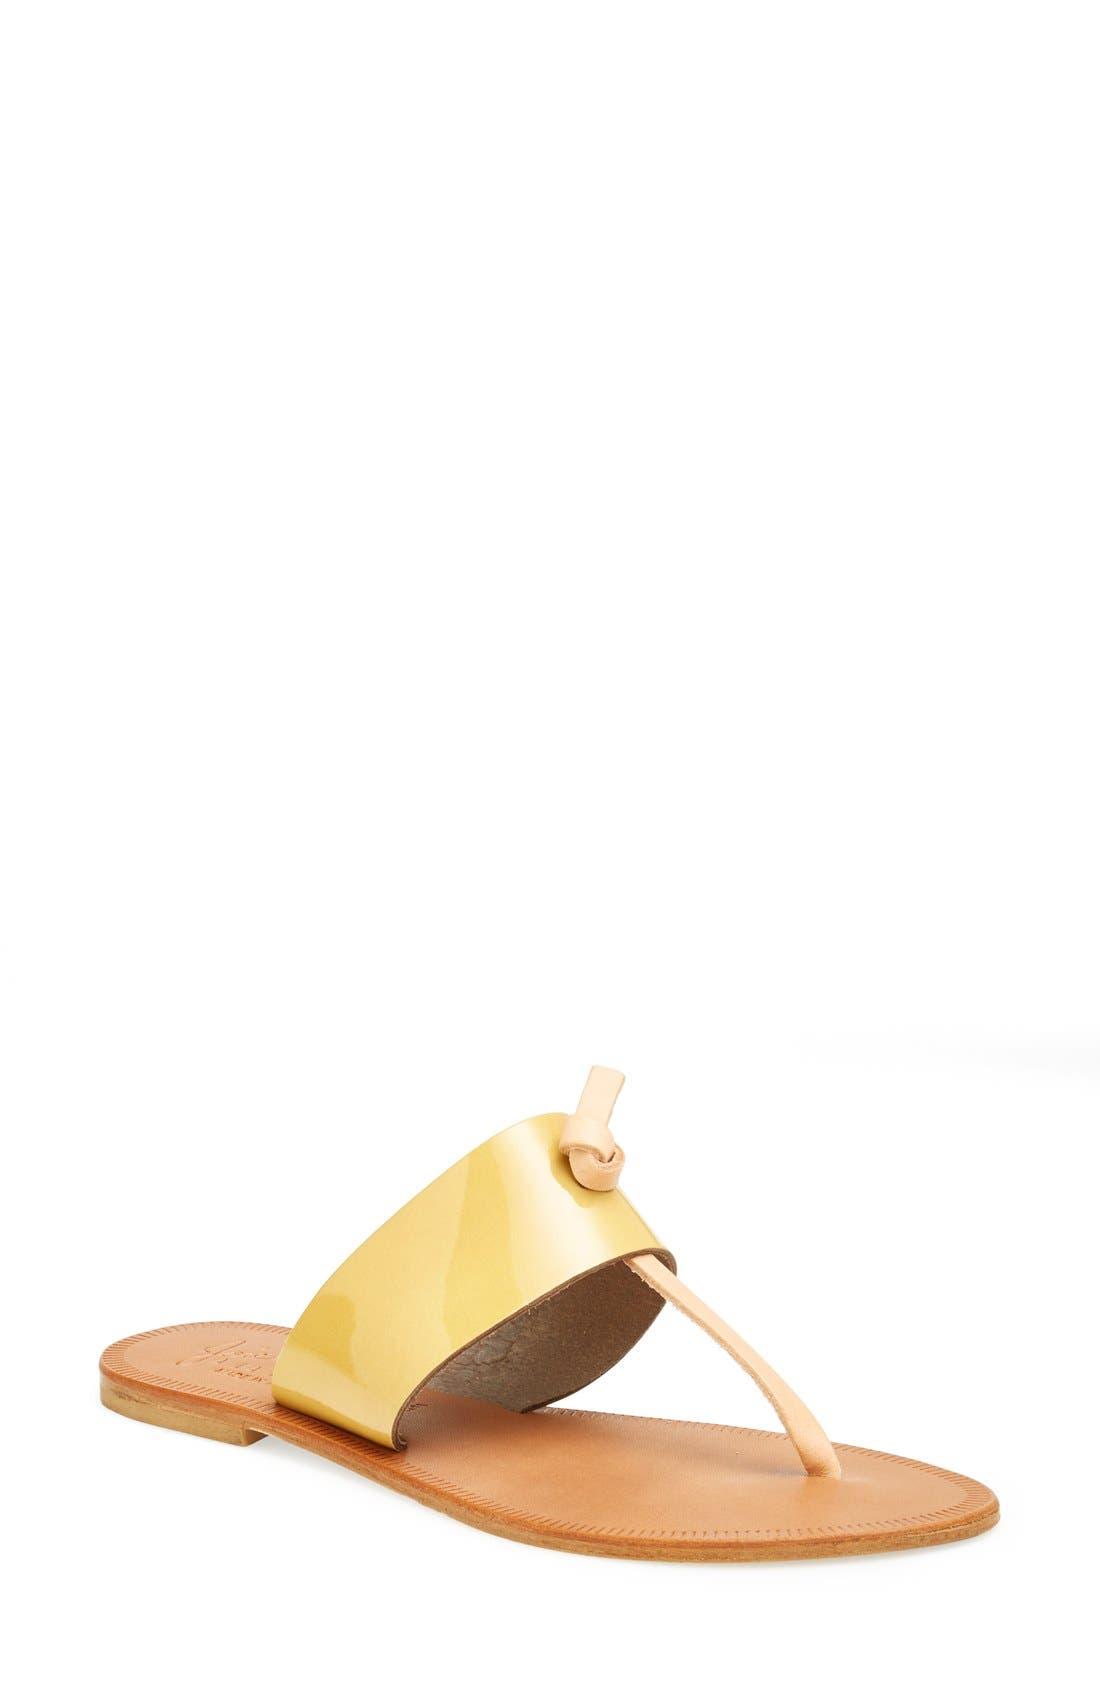 Main Image - Joie 'Nice' Sandal (Women)